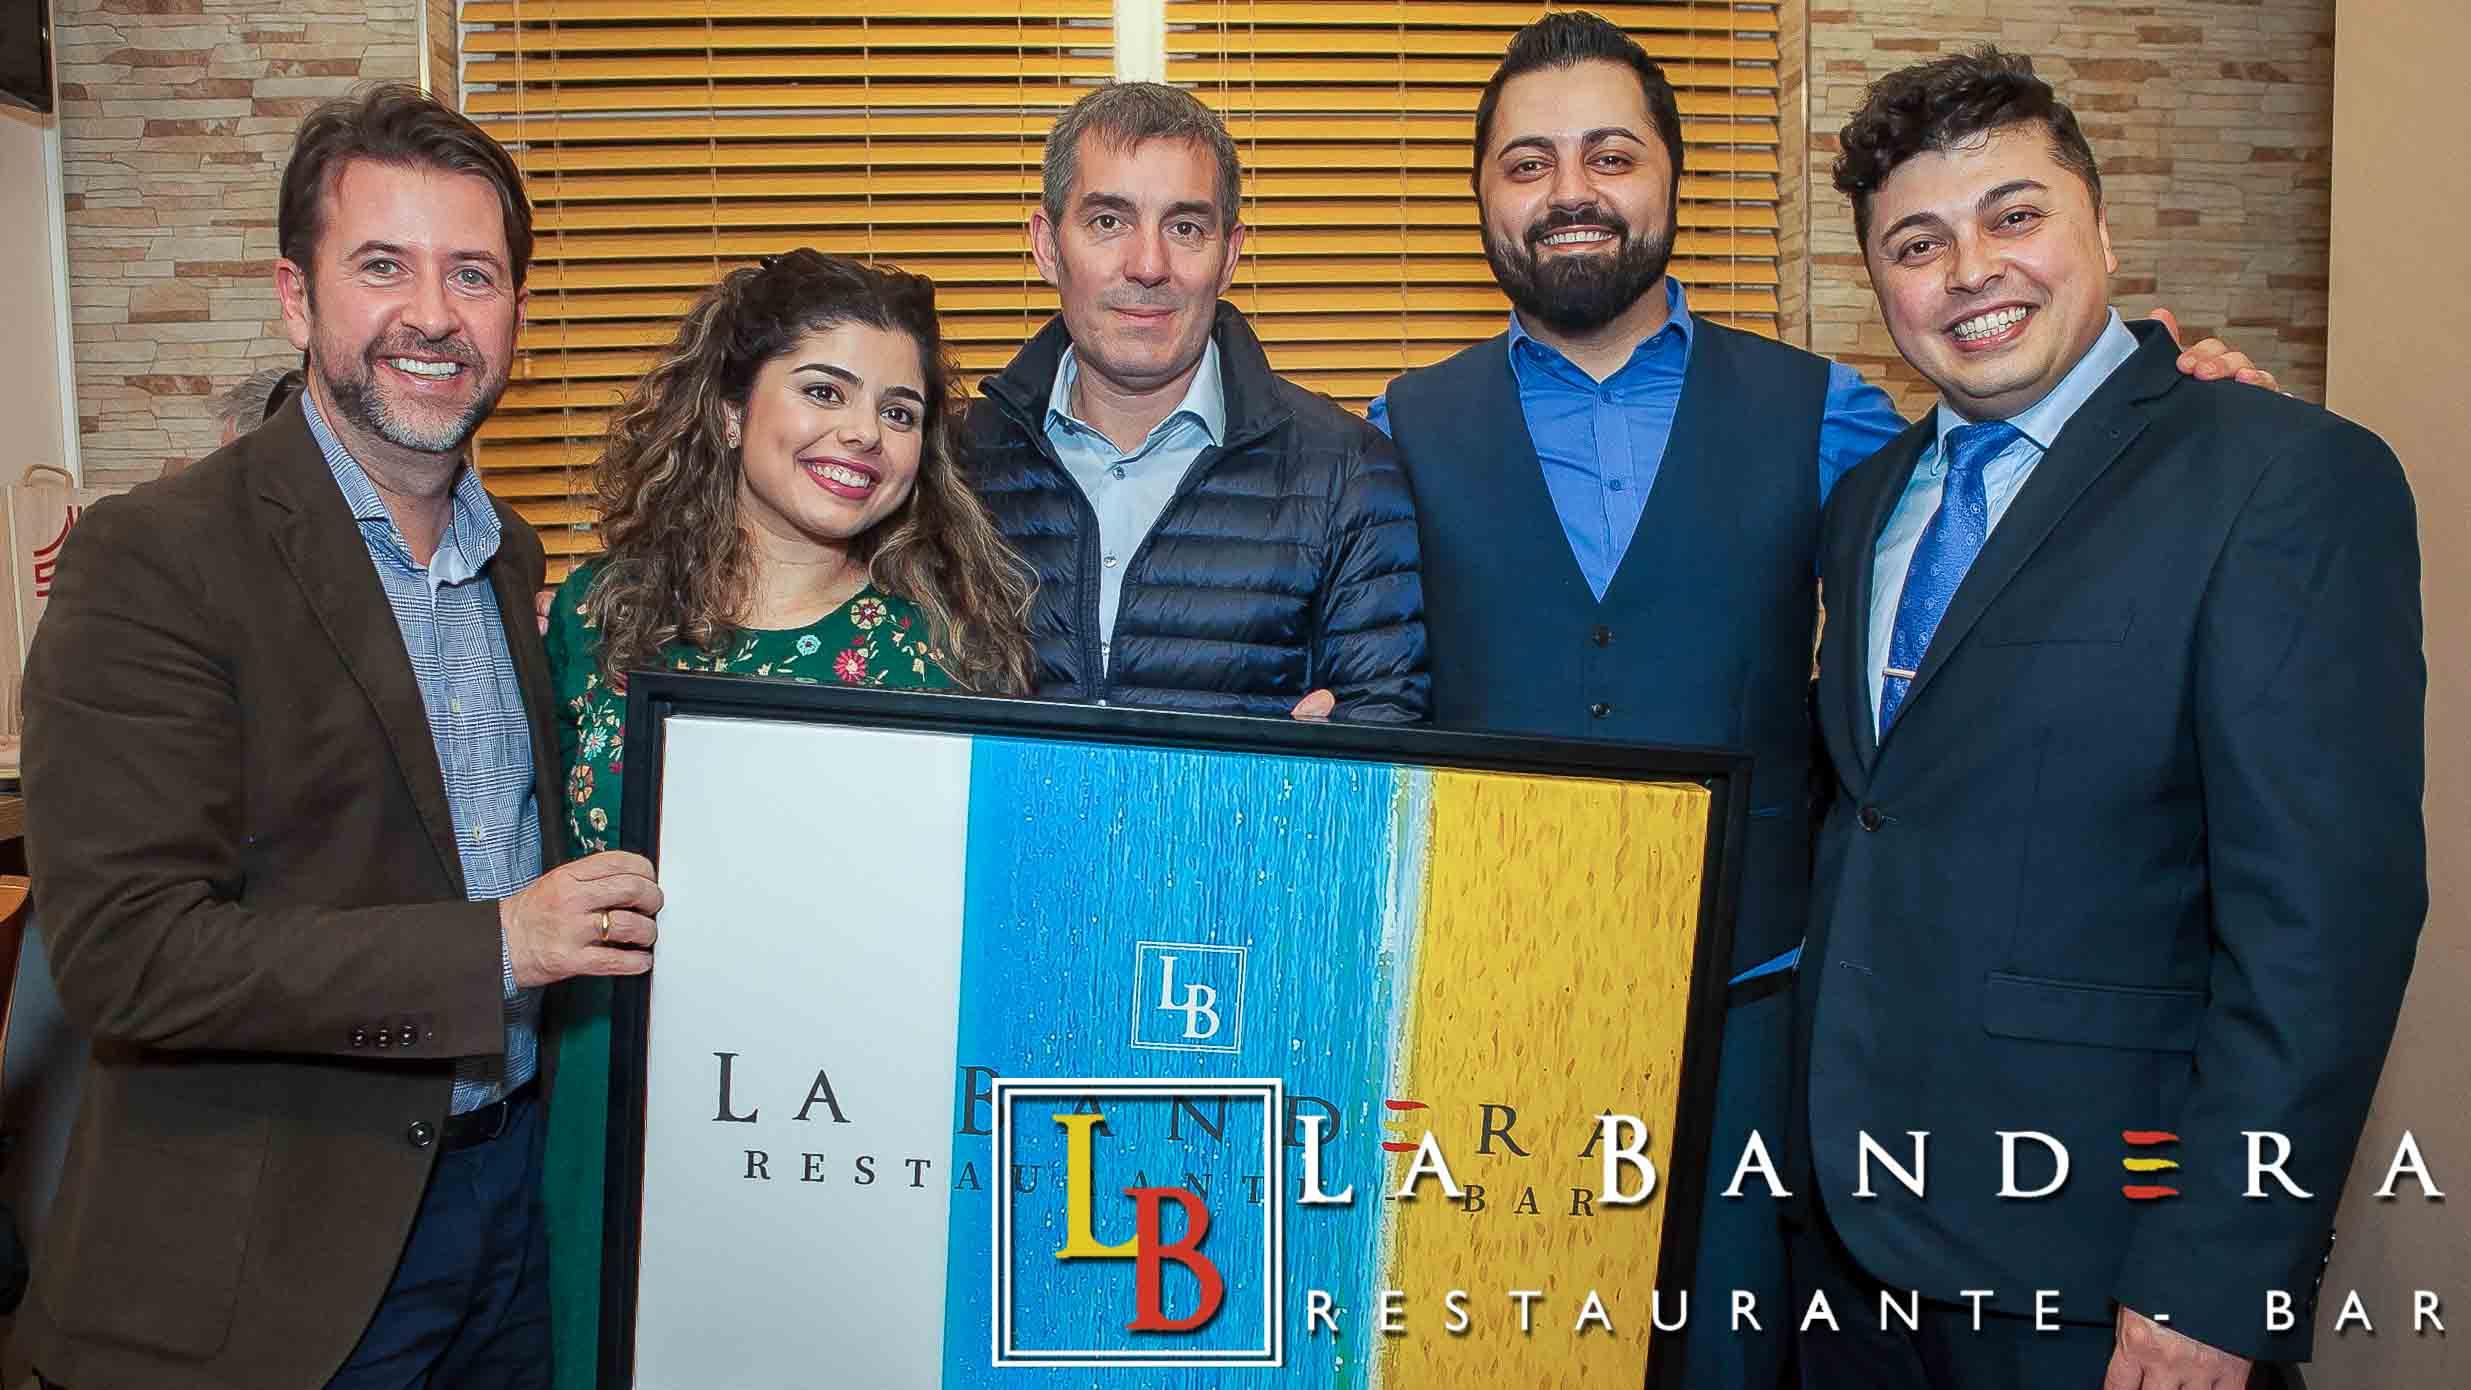 Fernando Clavijo and Carlos Alonso at La Bandera Restaurant